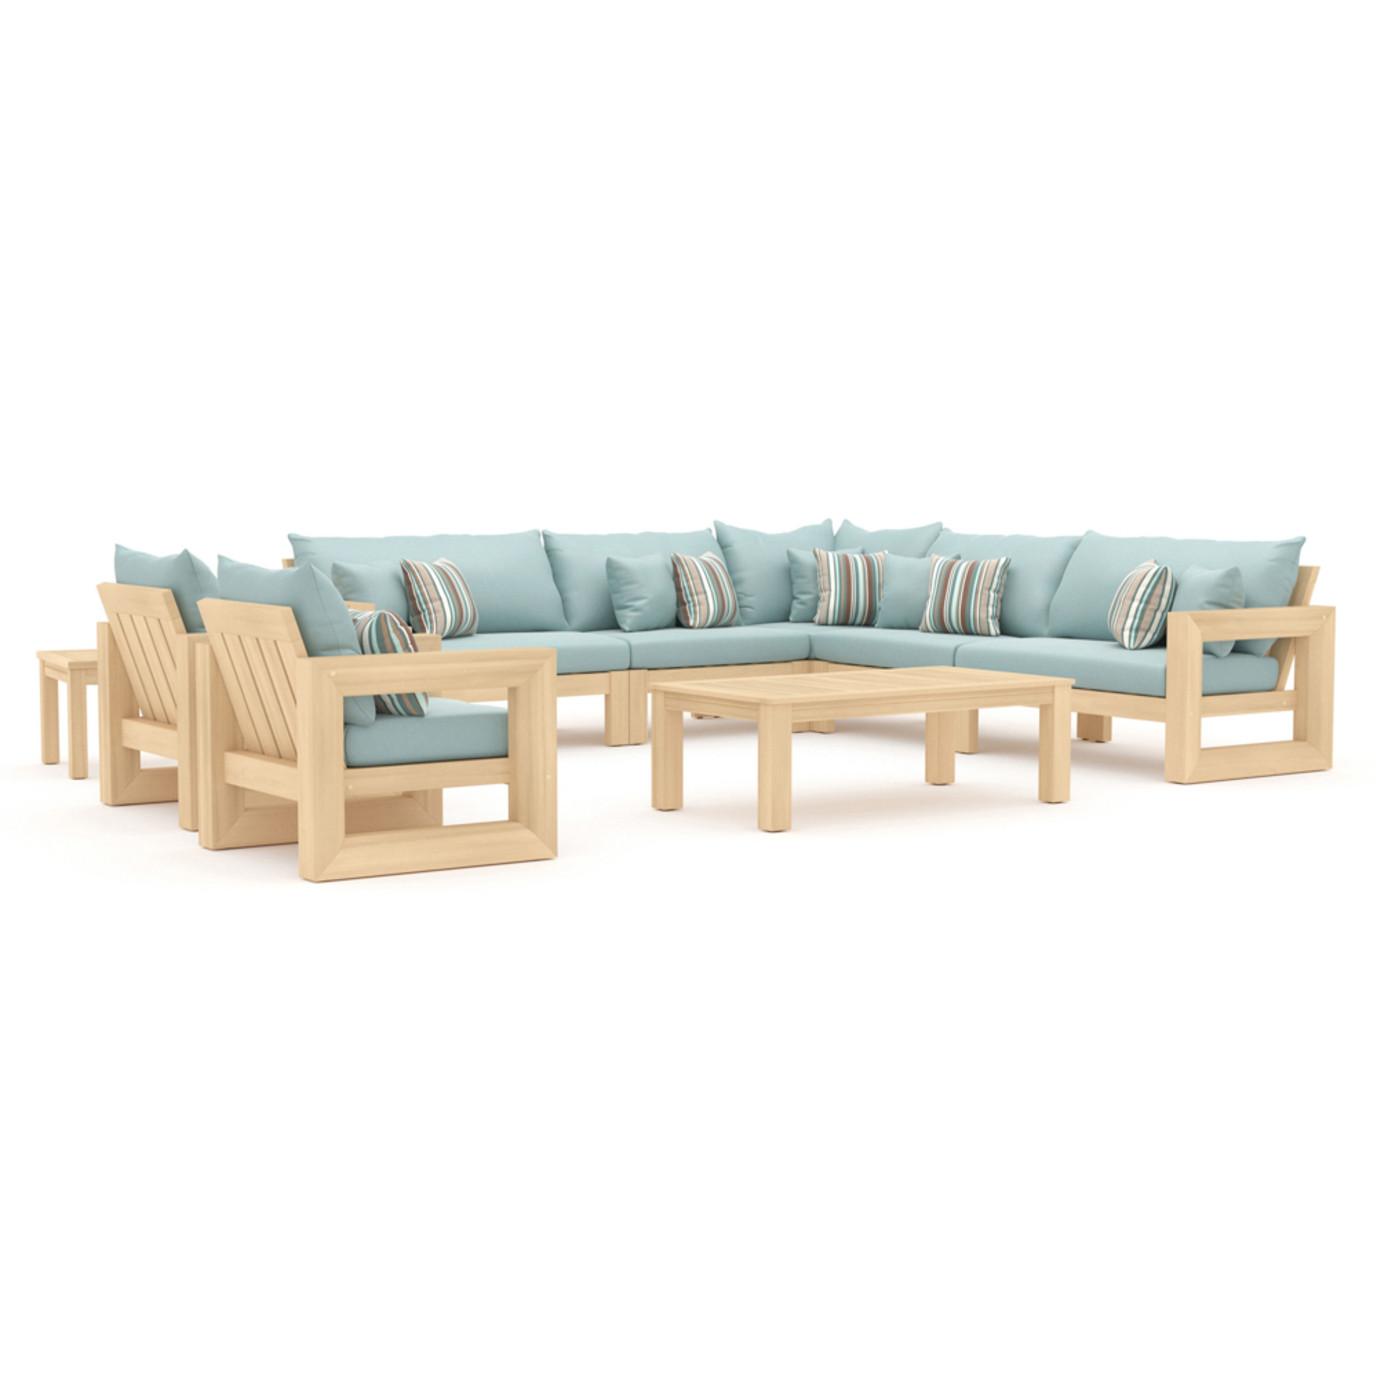 Benson 9pc Seating Set - Bliss Blue